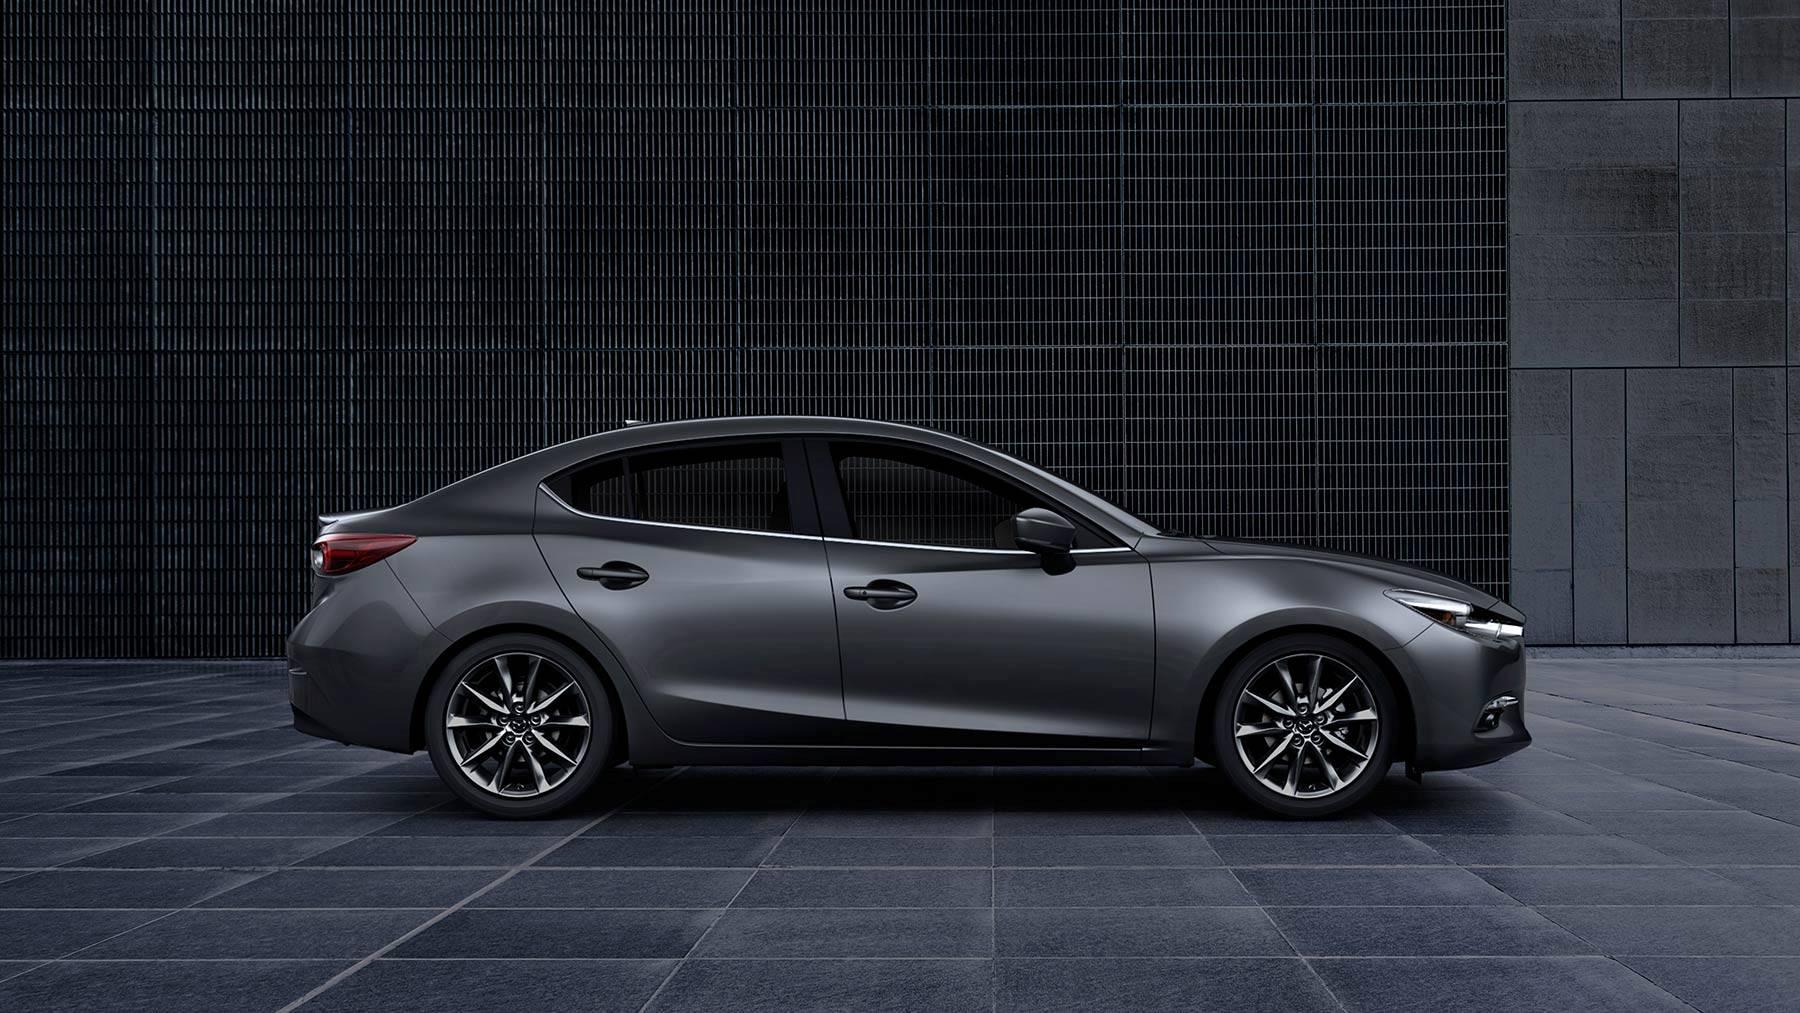 2018 Mazda3 Financing near Rockville, MD